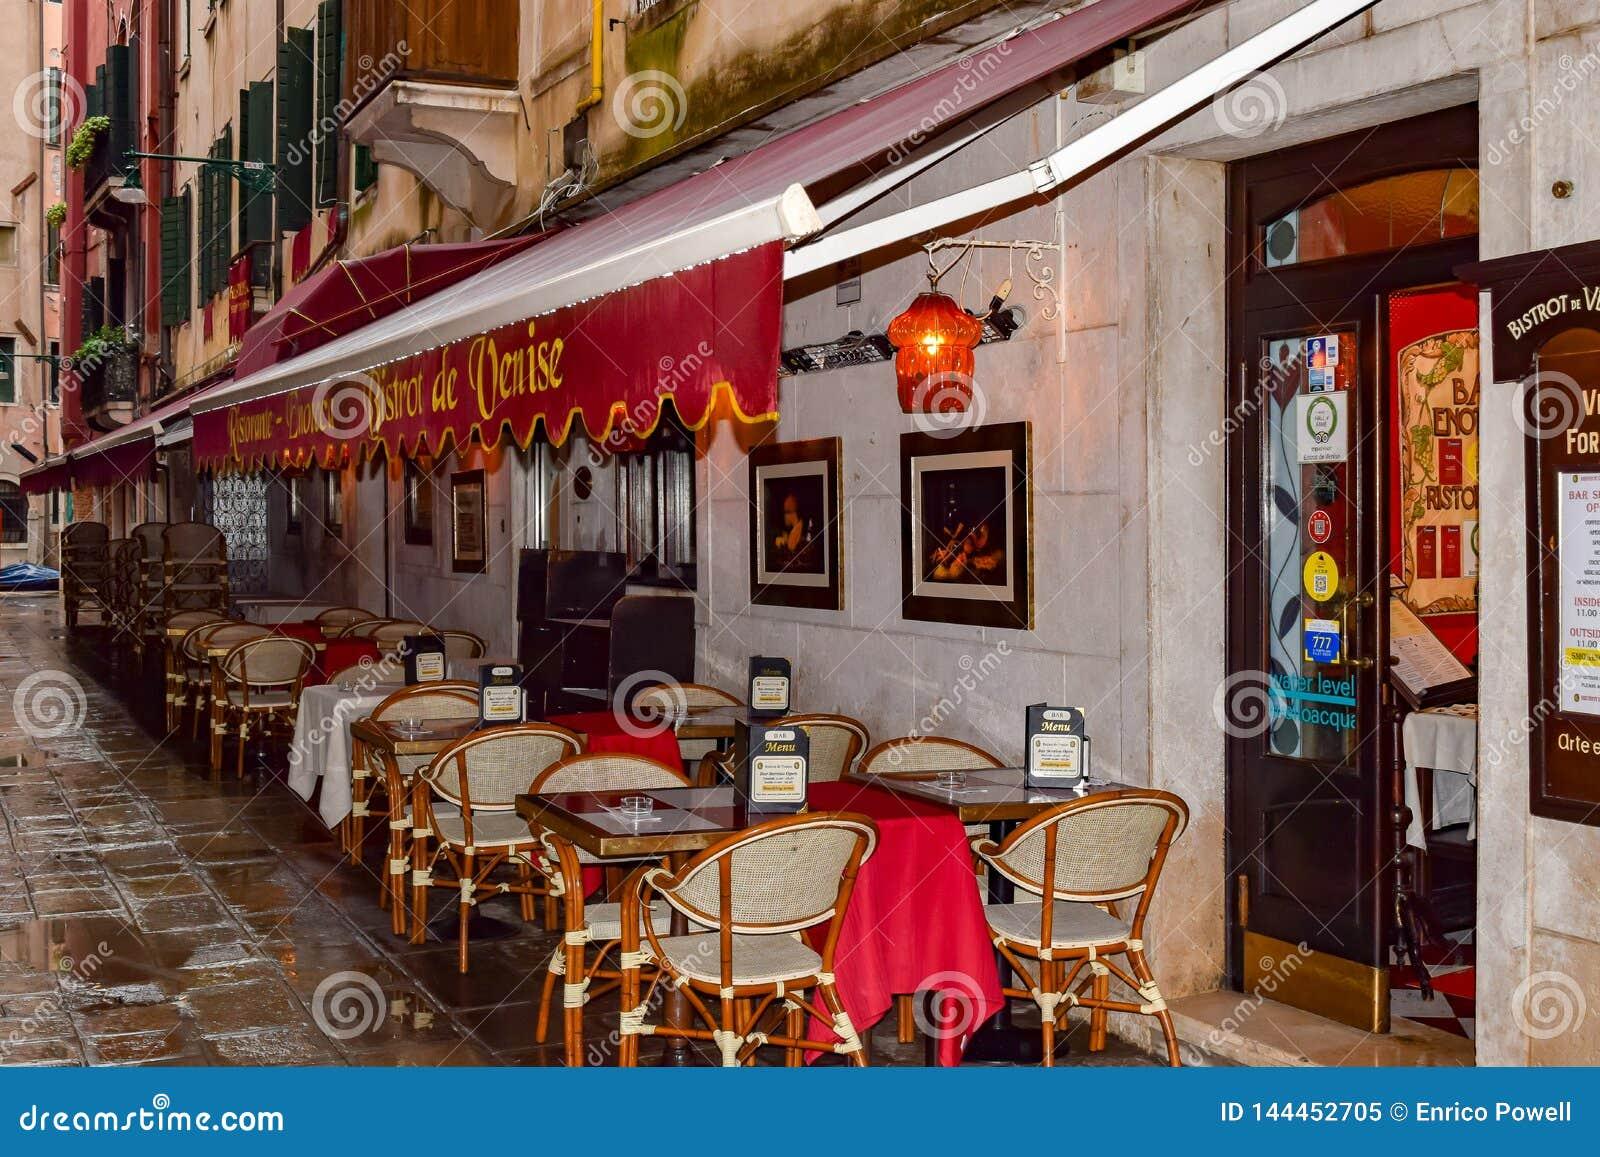 Bistrot de Venise. Traditional romantic outdoor dining Italian bistro restaurant setting.